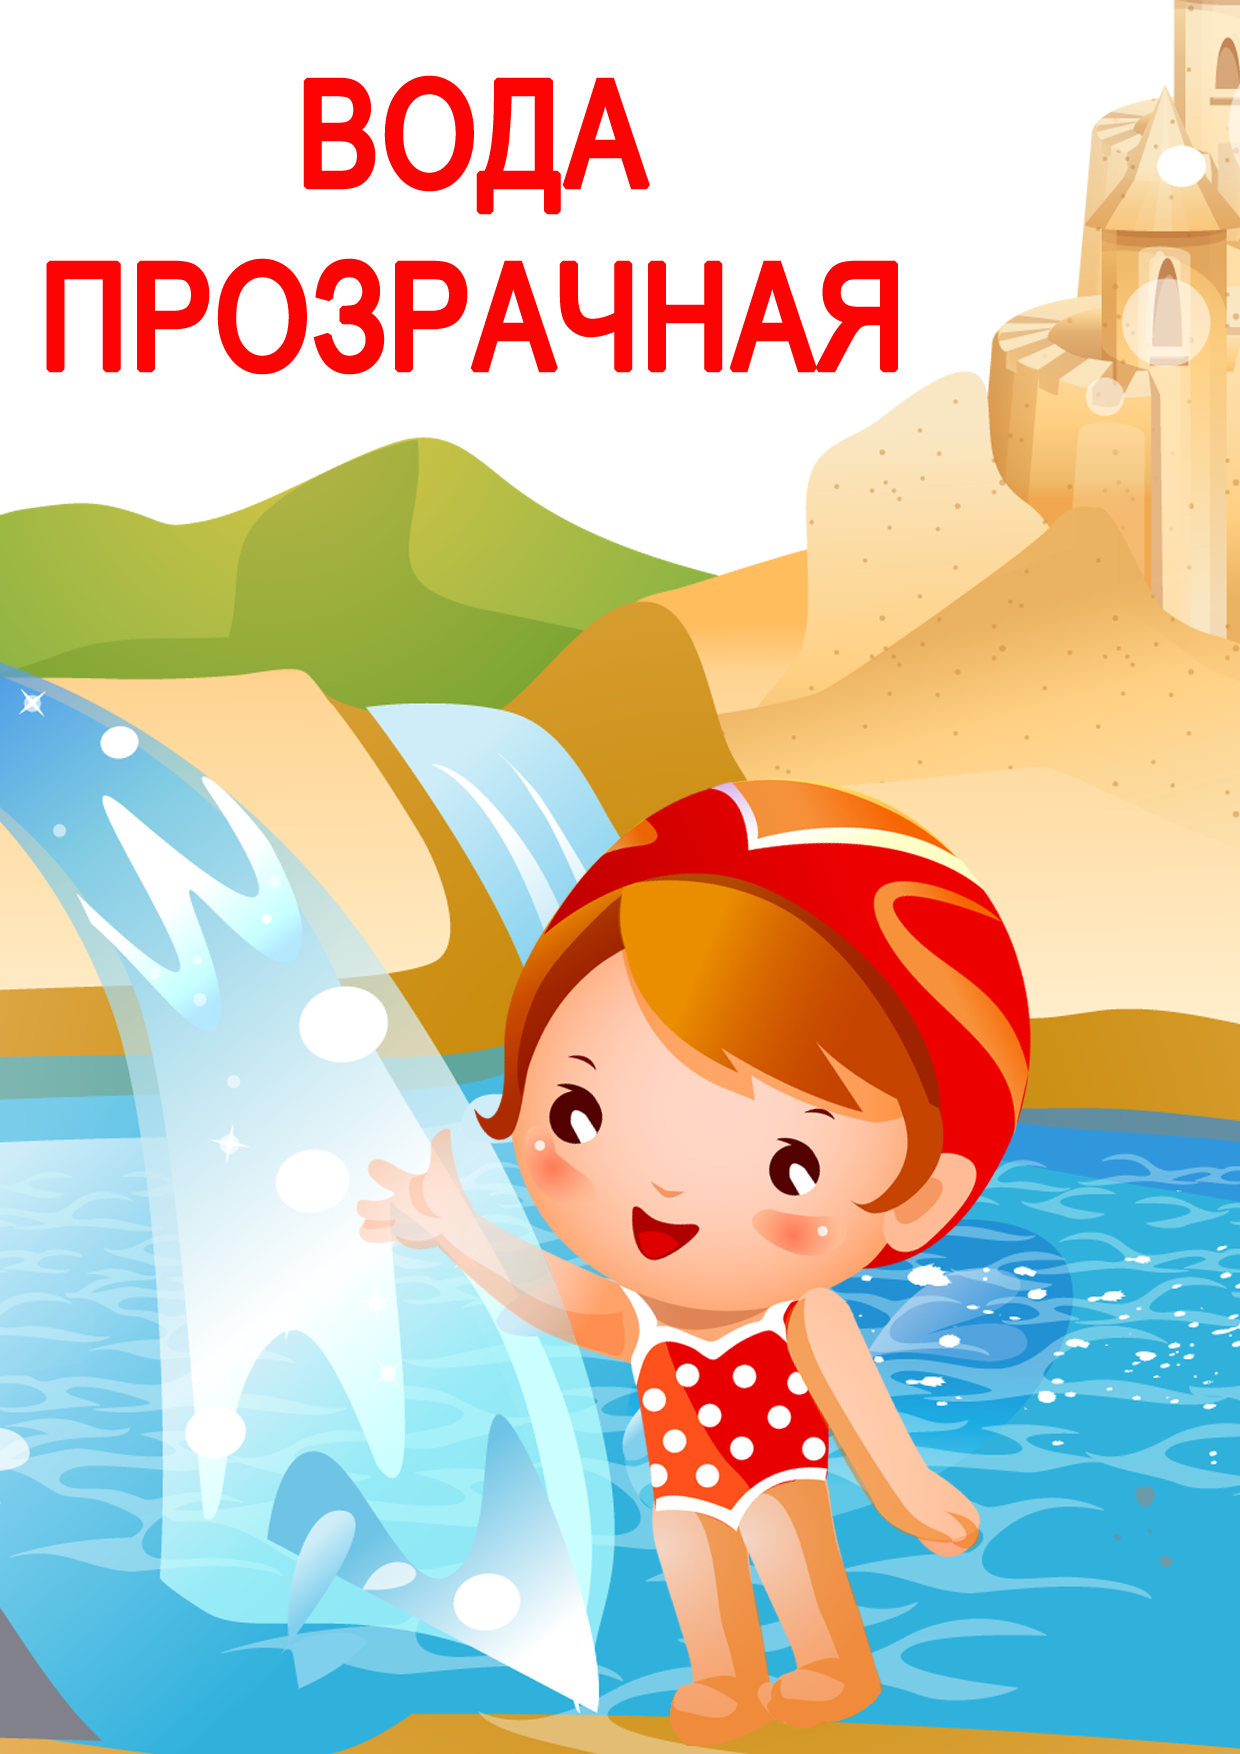 Игры на воде летом картинки